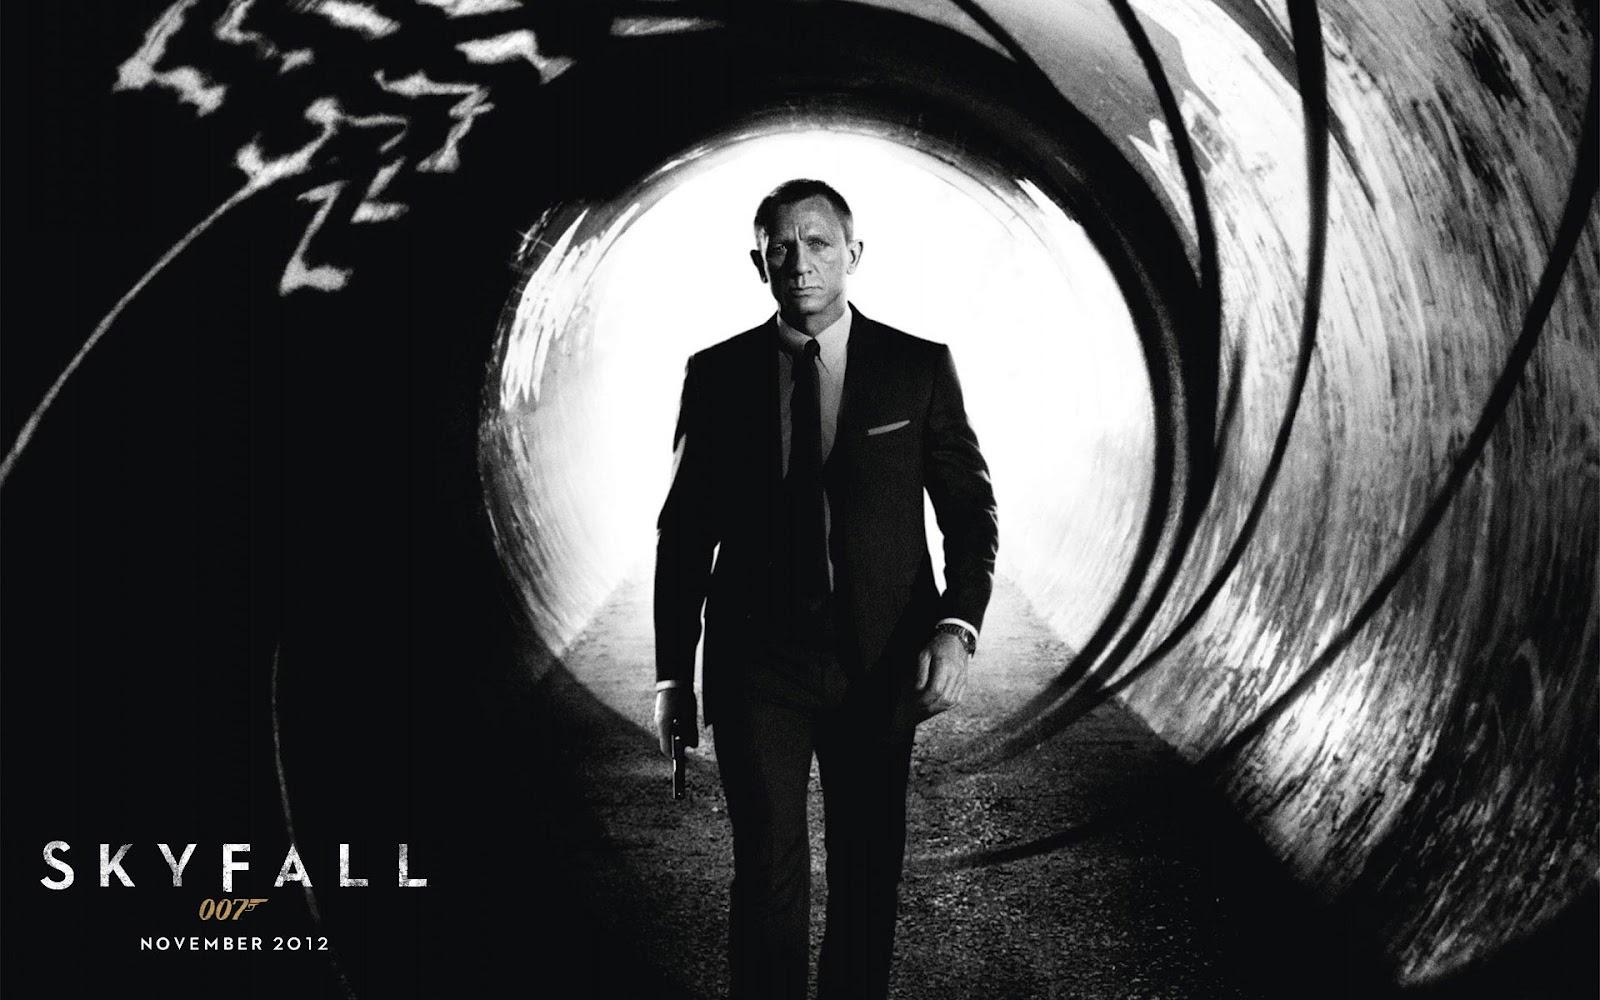 Wallpaper 007 Skyfall | Free Download Wallpaper | DaWallpaperz